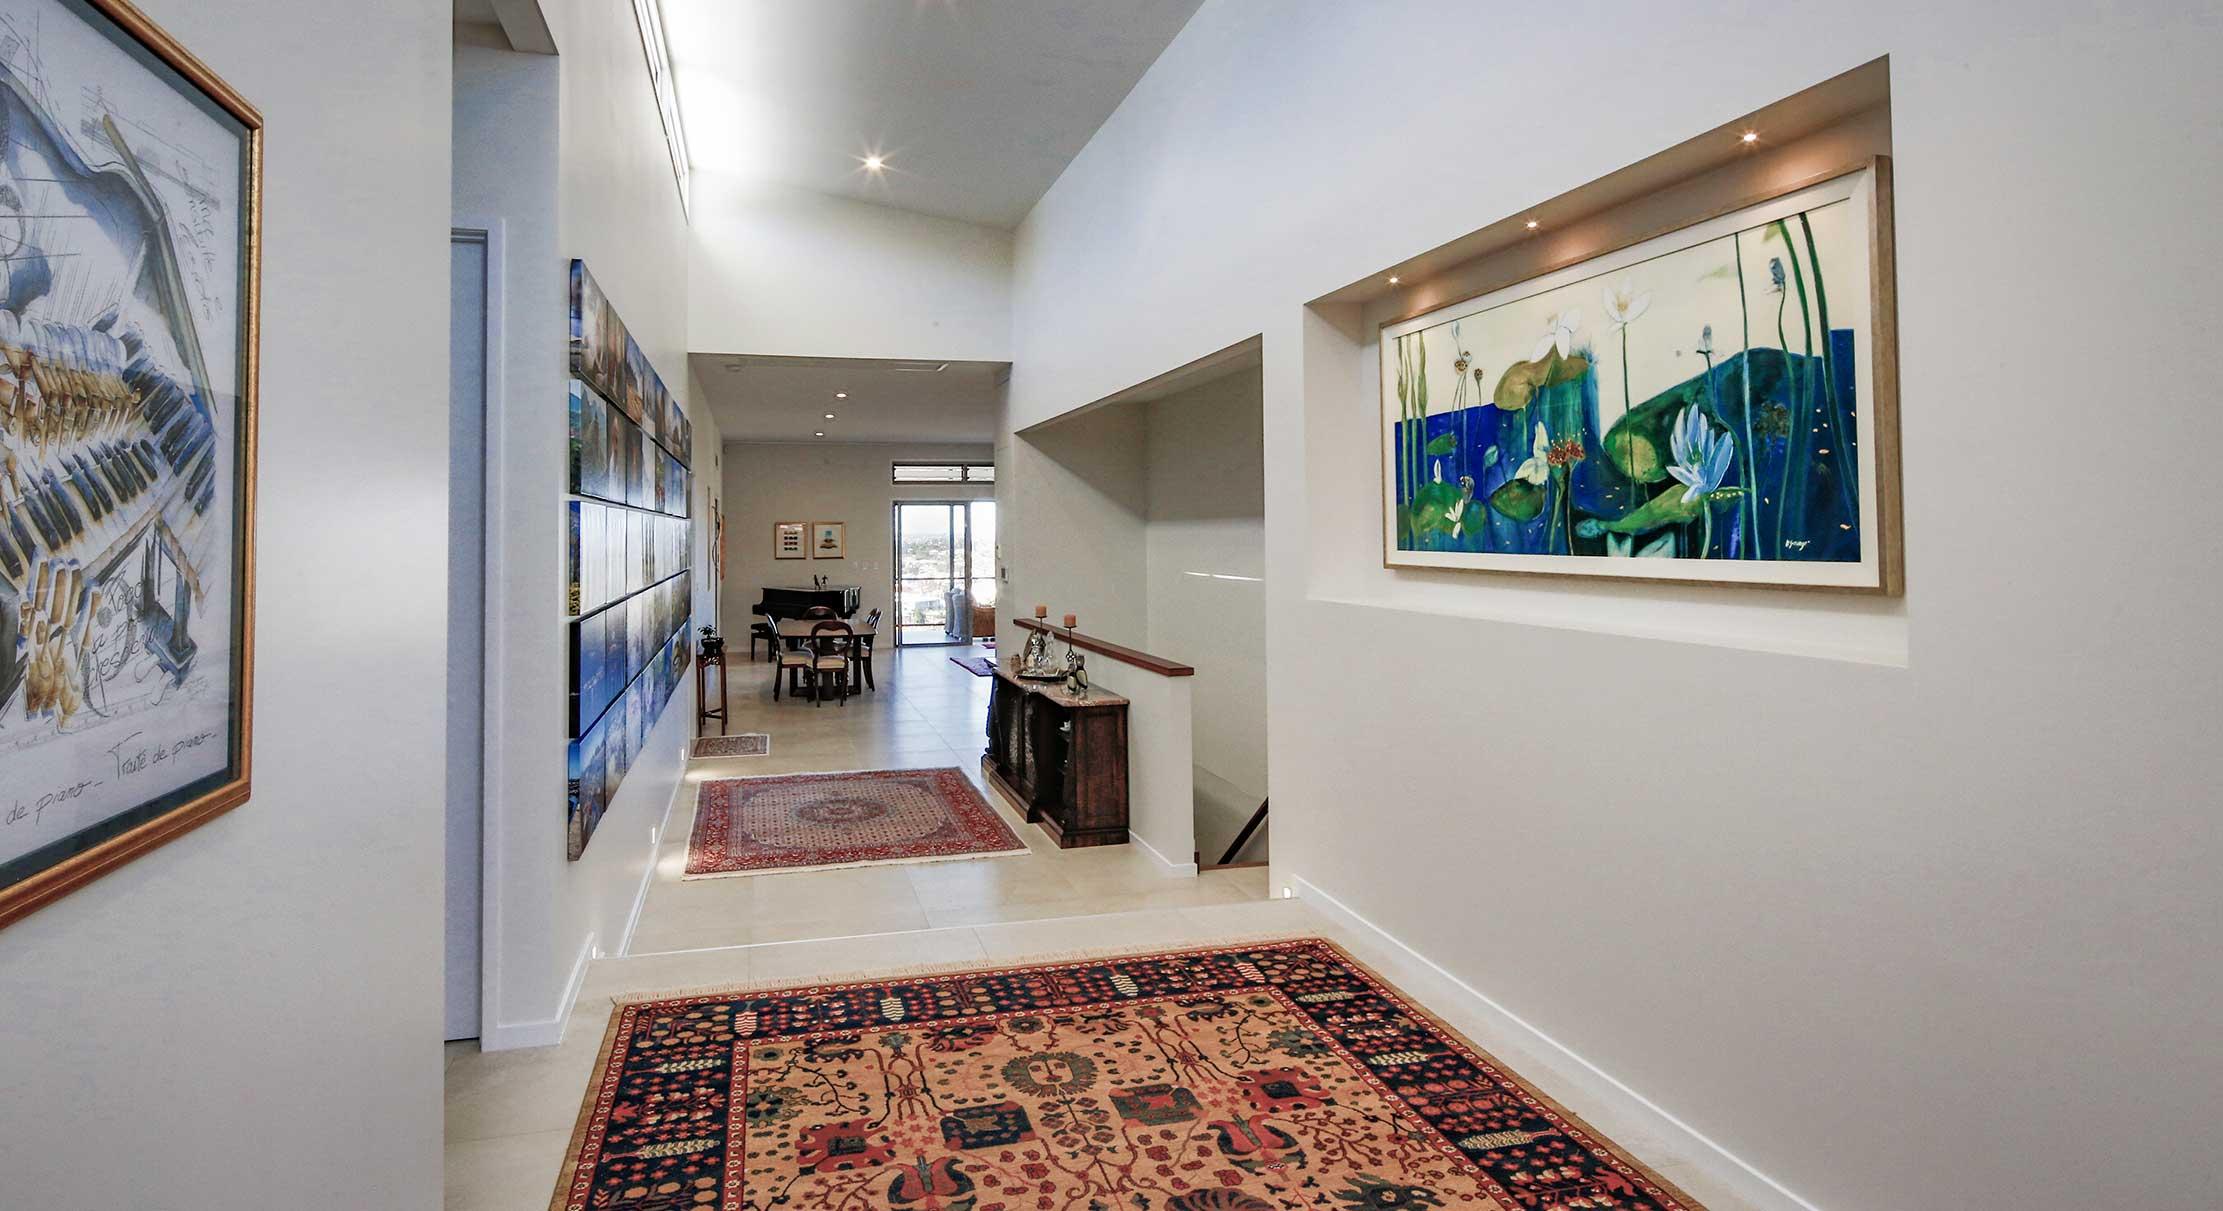 portfolio-3-slider-image-6-hallway-reversed-gary-cramb-constructions-brisbane